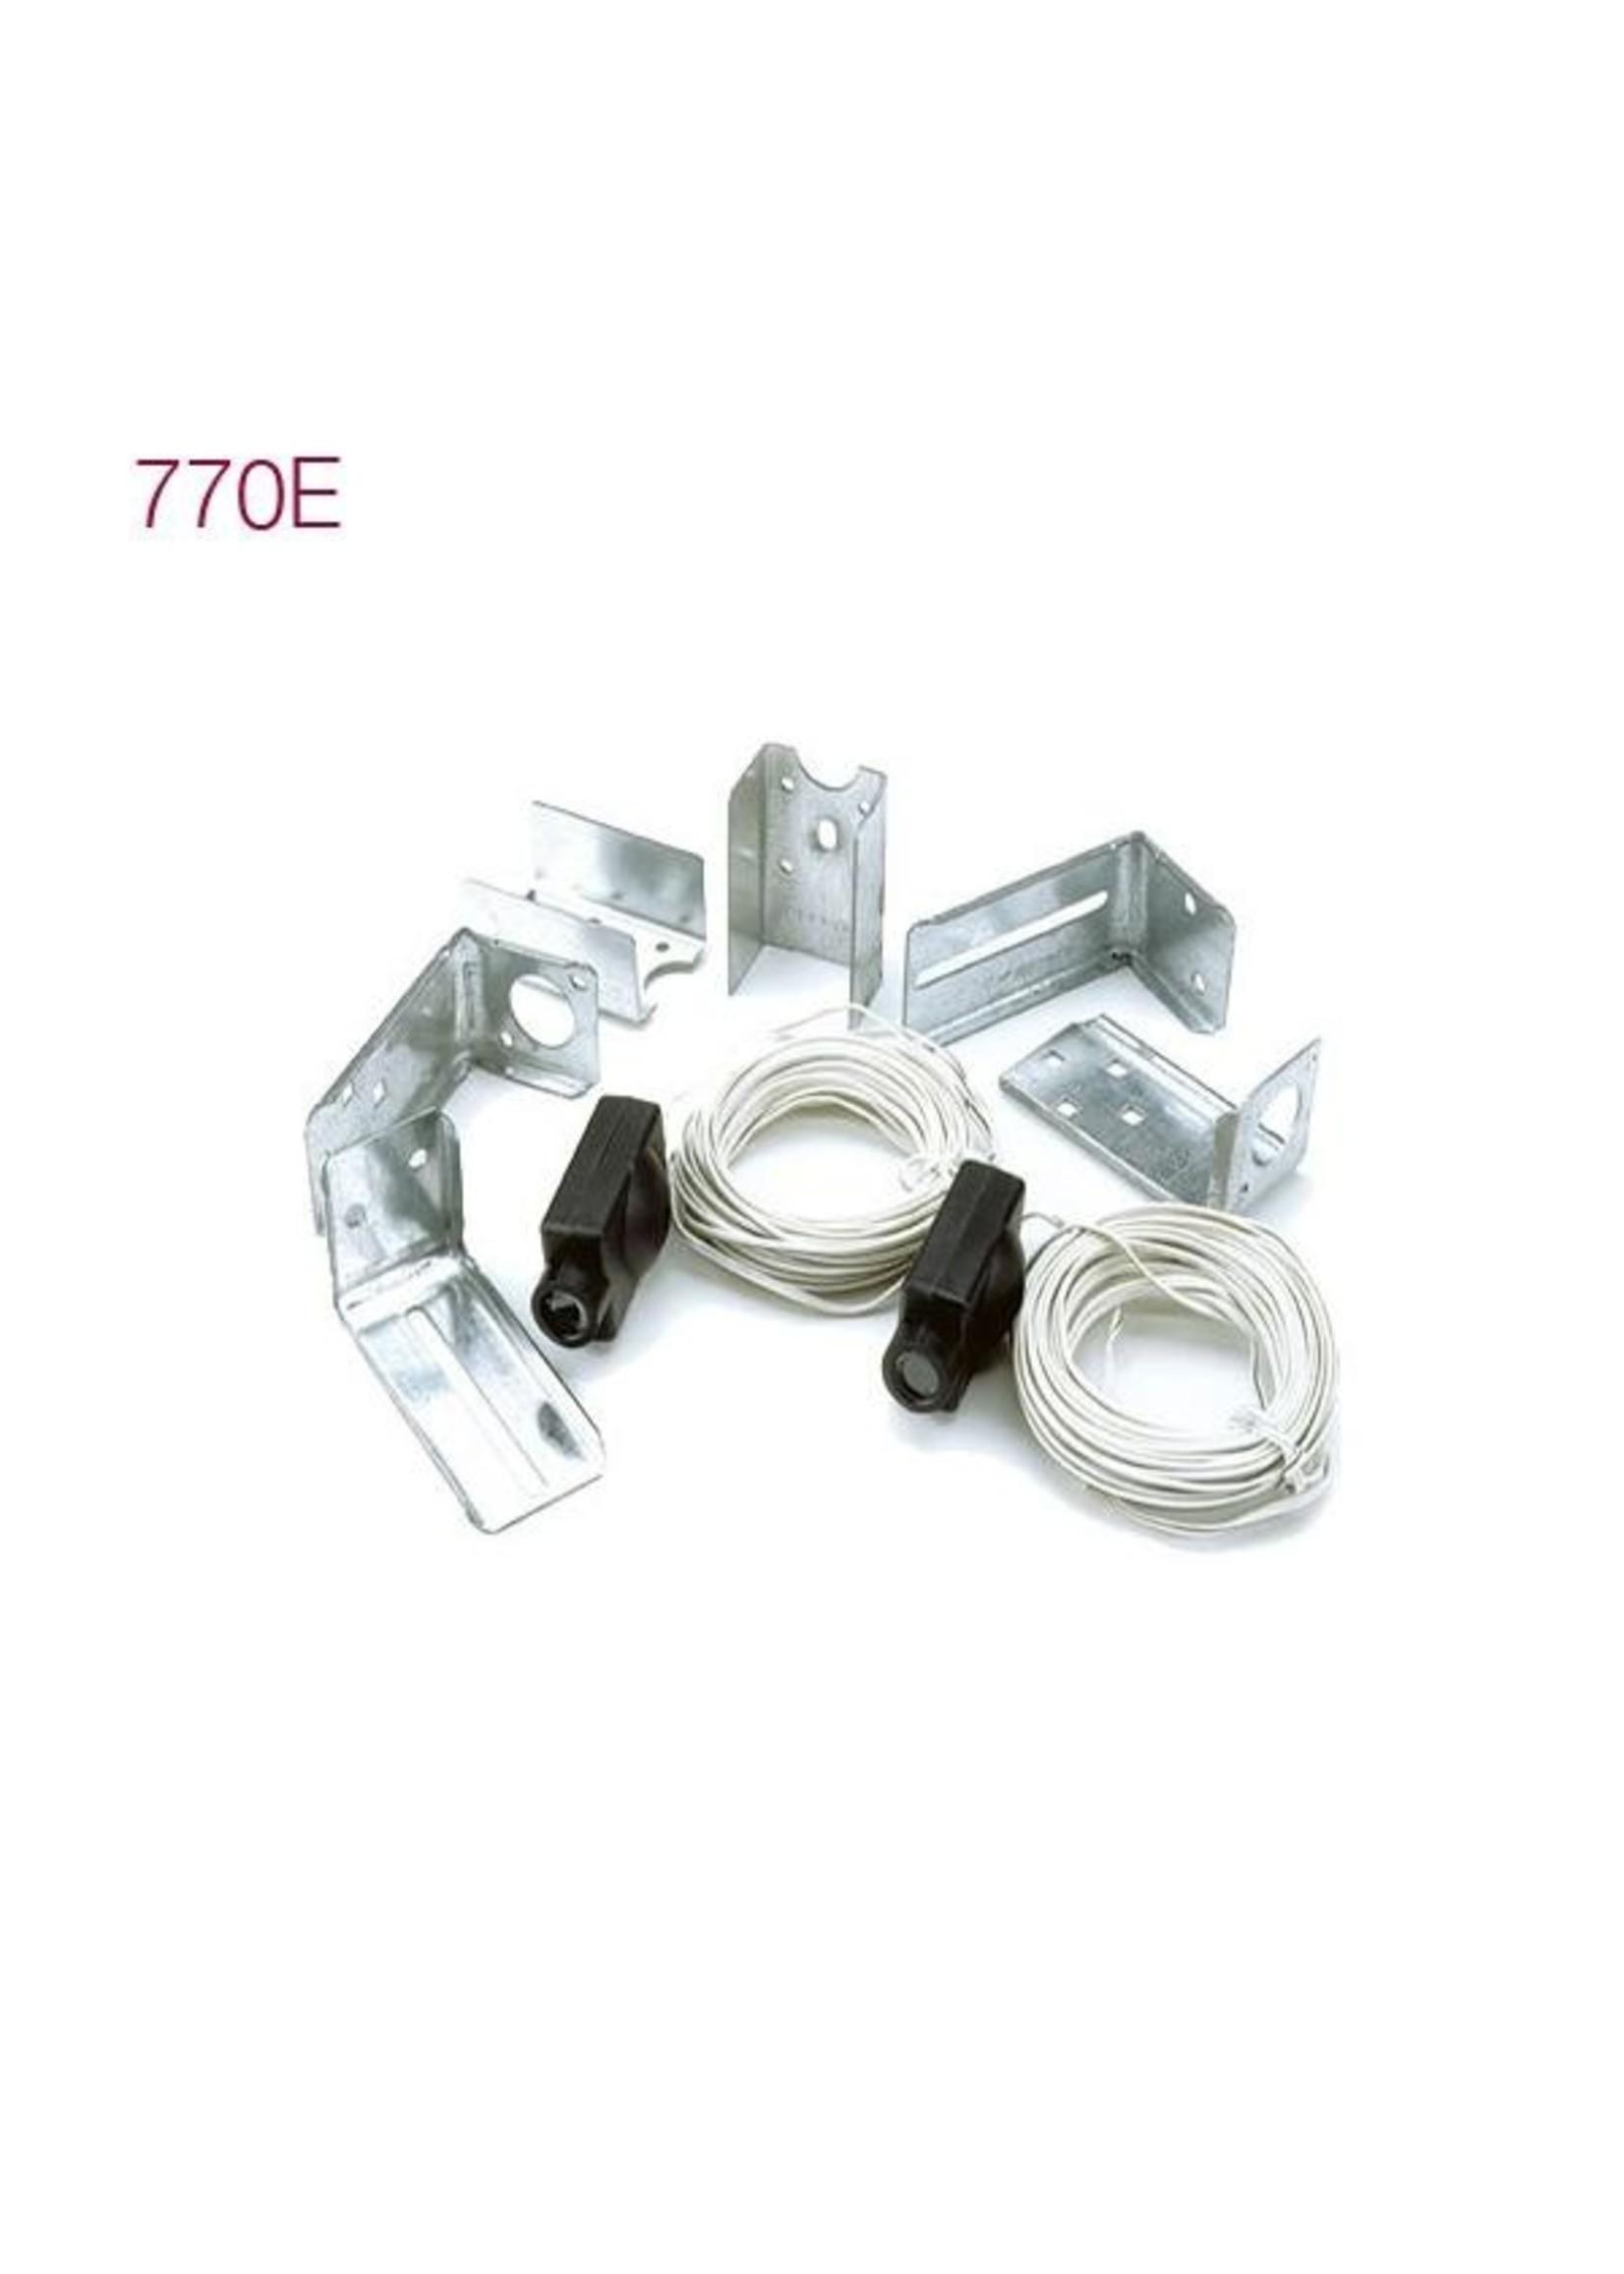 Liftmaster Photocellules 770E